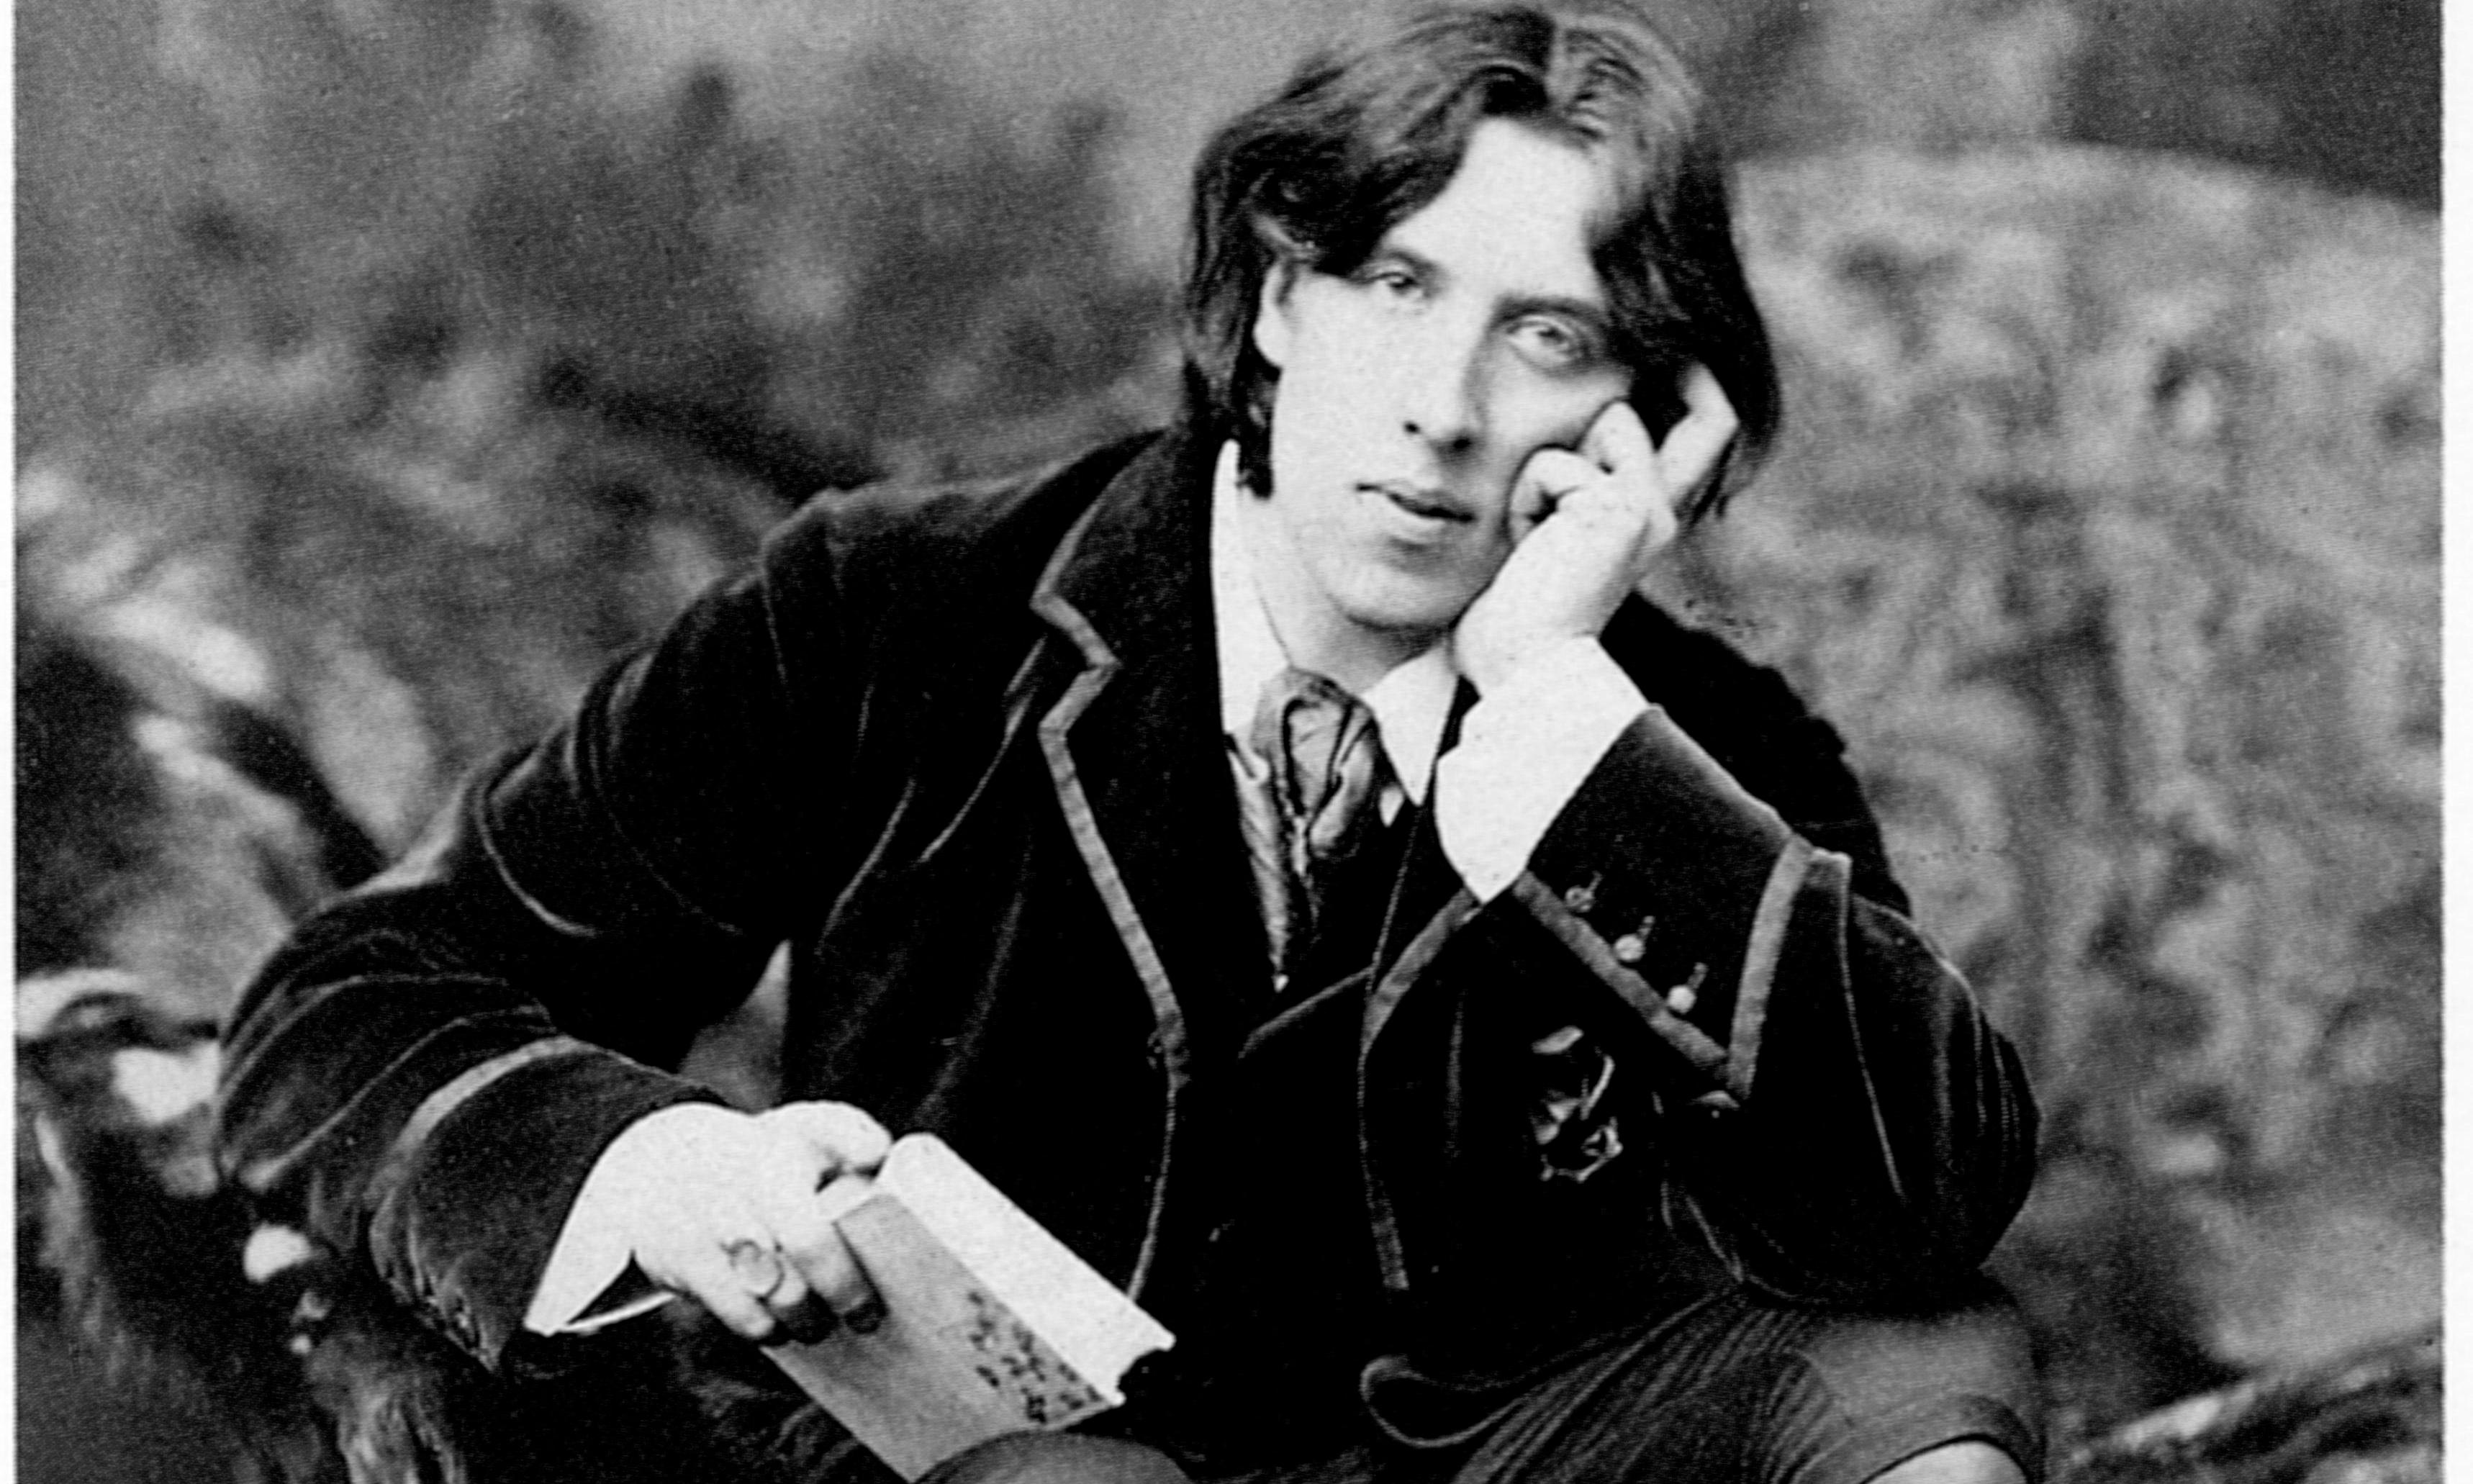 Forbidden love: the original Dorian Gray revealed, direct from Oscar Wilde's pen